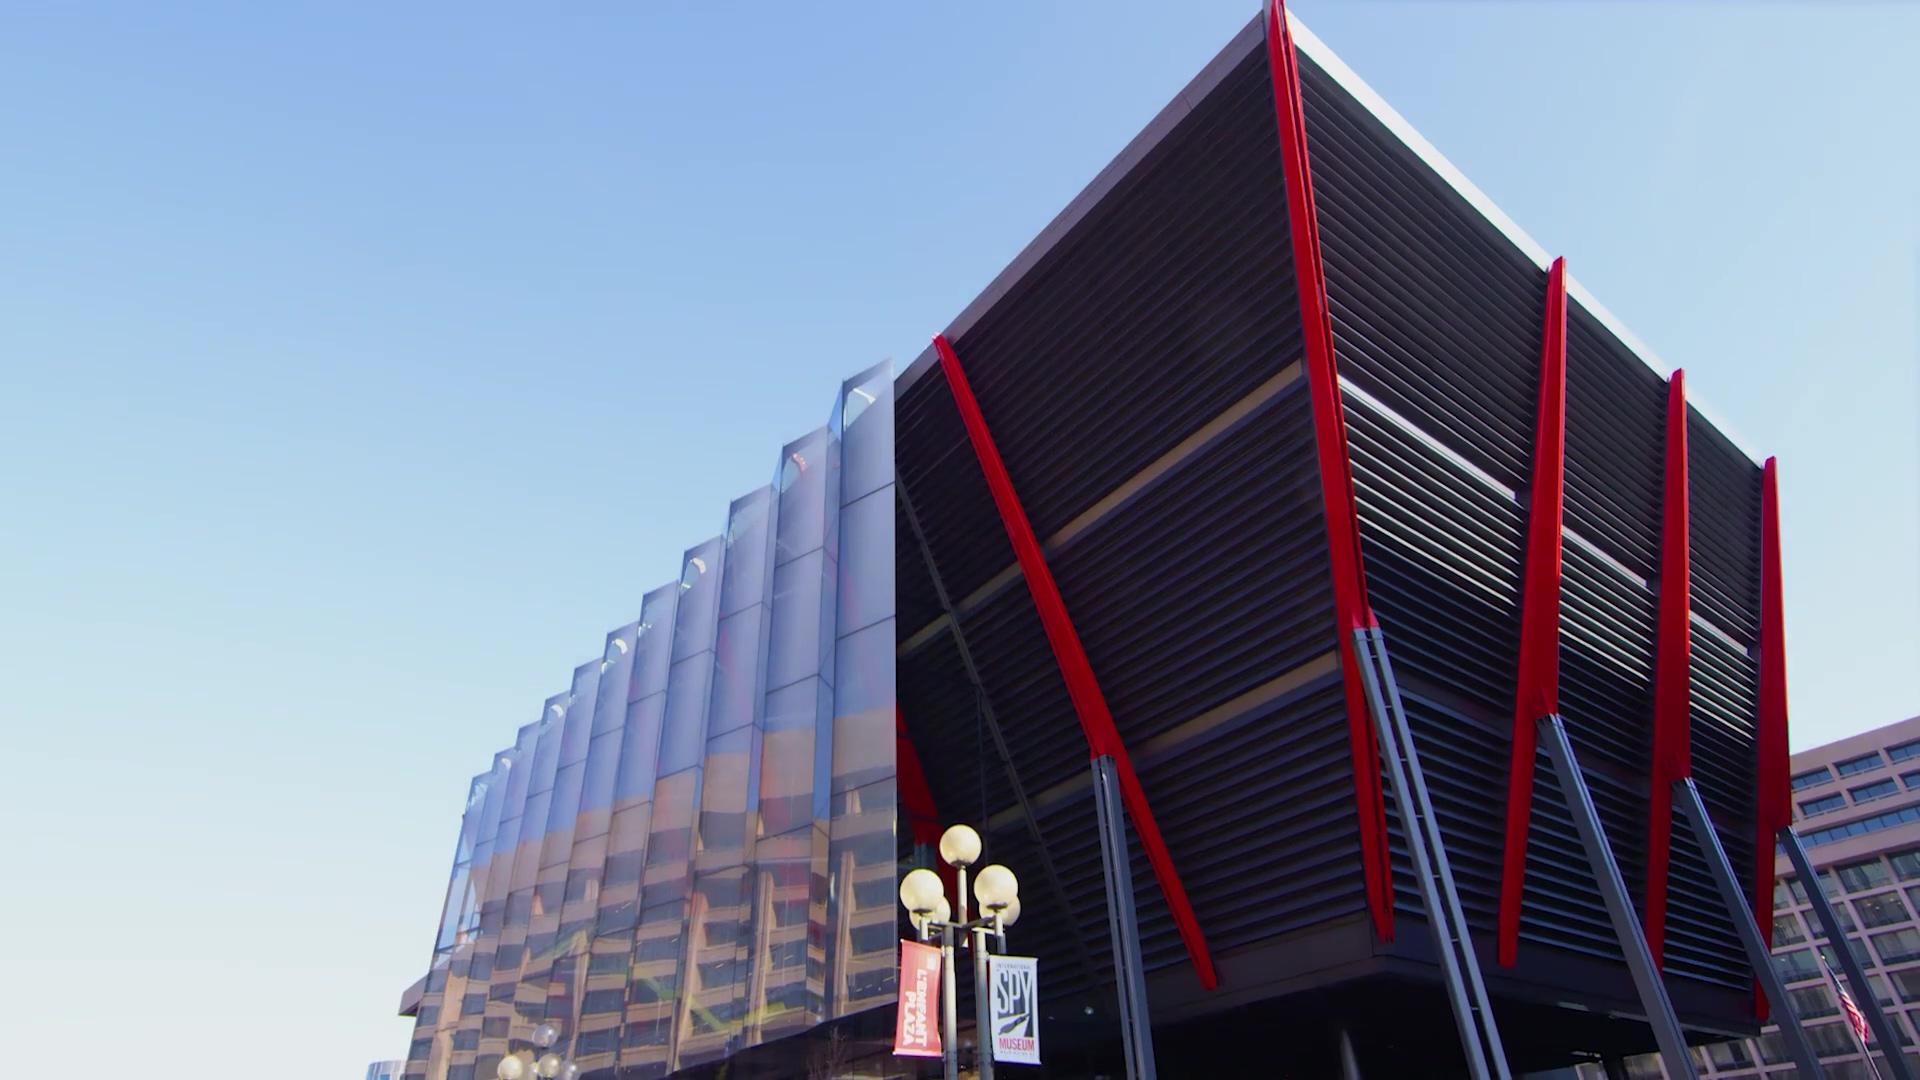 The International Spy Museum, By Electrosonic  - 1080p